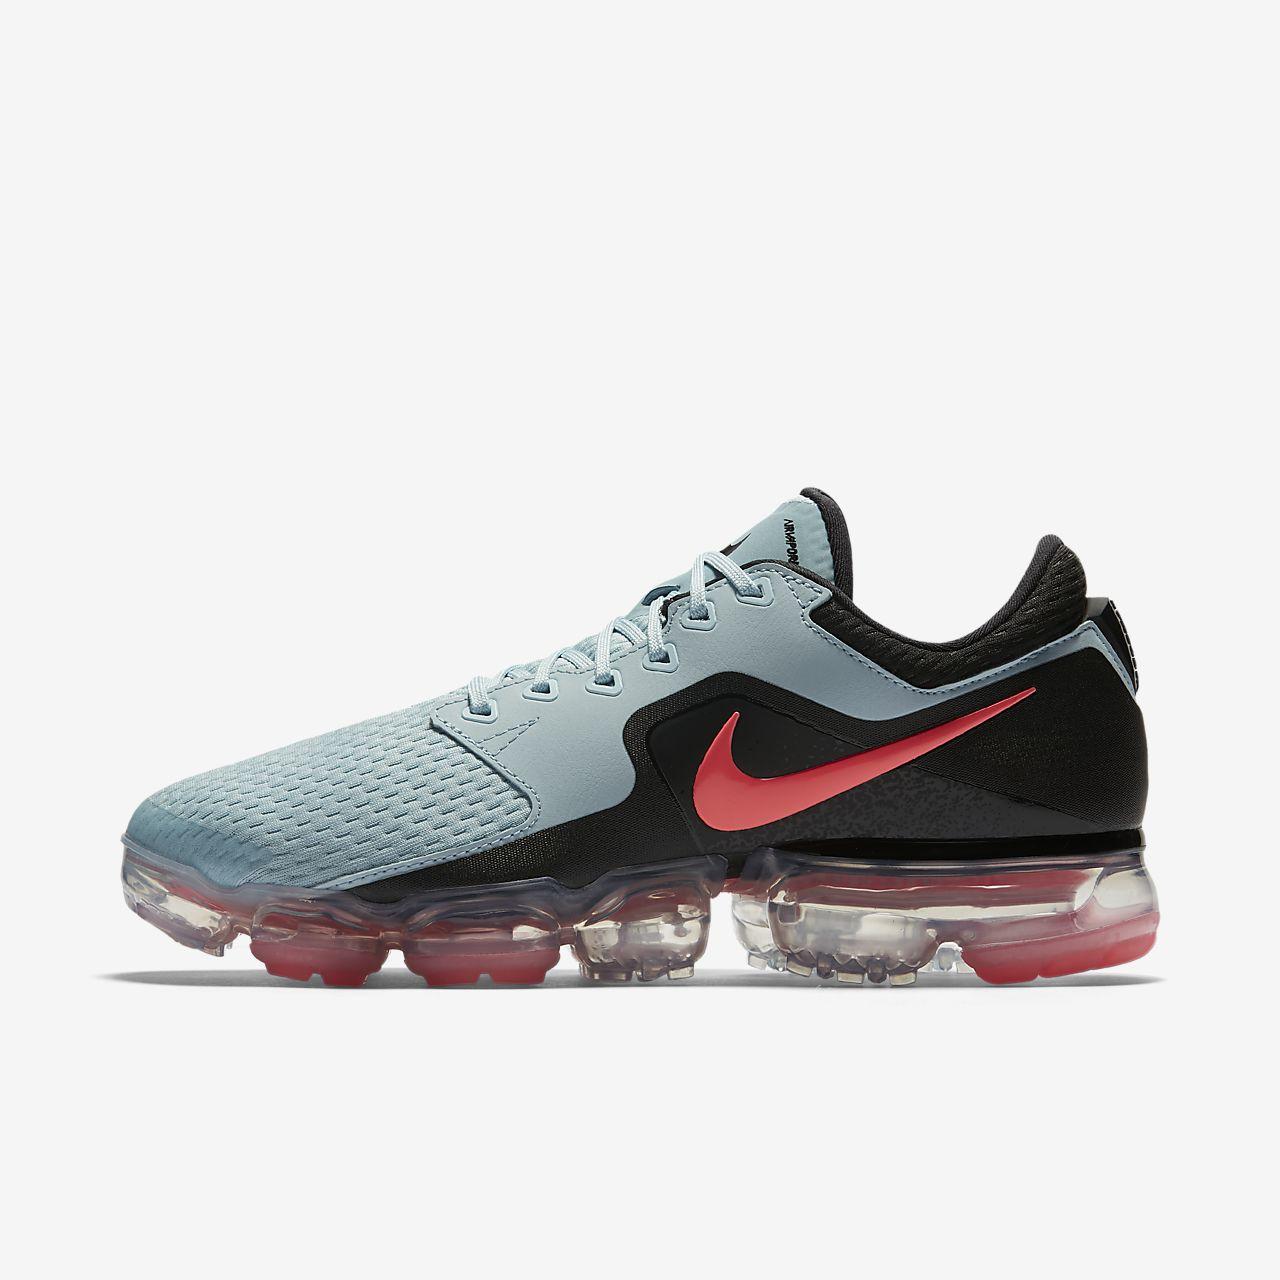 Chaussure Nike Air VaporMax pour Femme